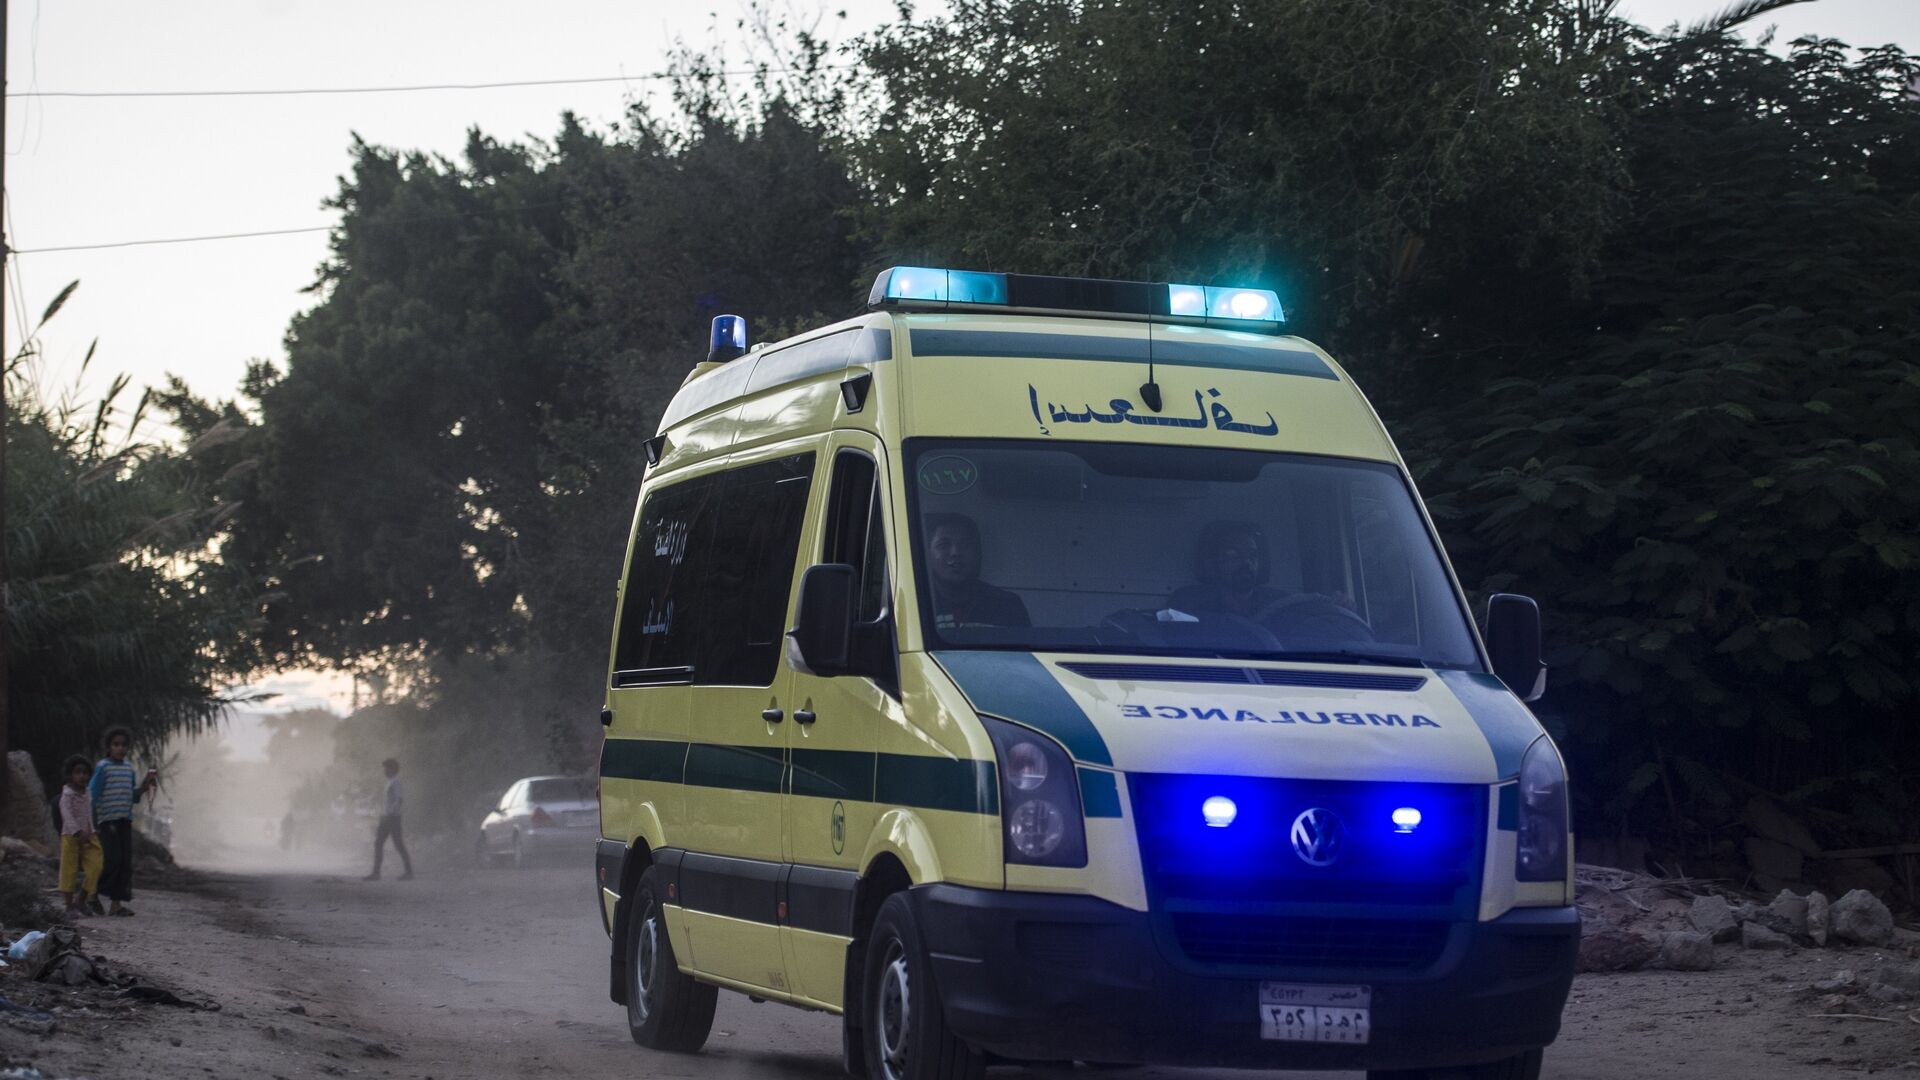 Ambulancia en Egipto - Sputnik Mundo, 1920, 05.03.2021